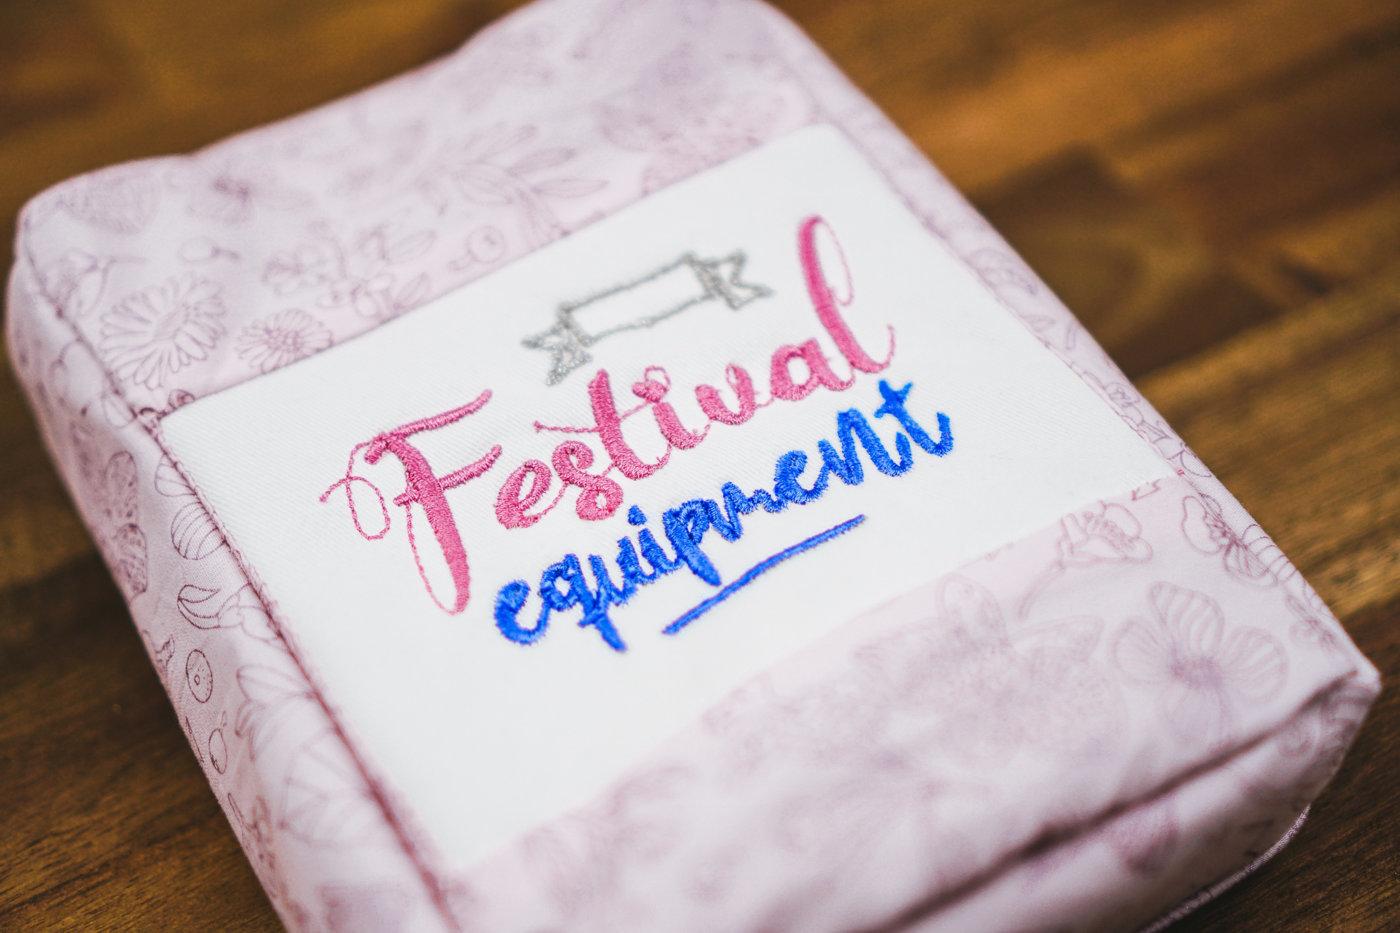 Festival Stickdatei [object object] Stickdatei »Festival equipment« + GRATIS Schnittmuster Bauchtasche ✨❤️ stickdatei festival equipment 02 1400x933